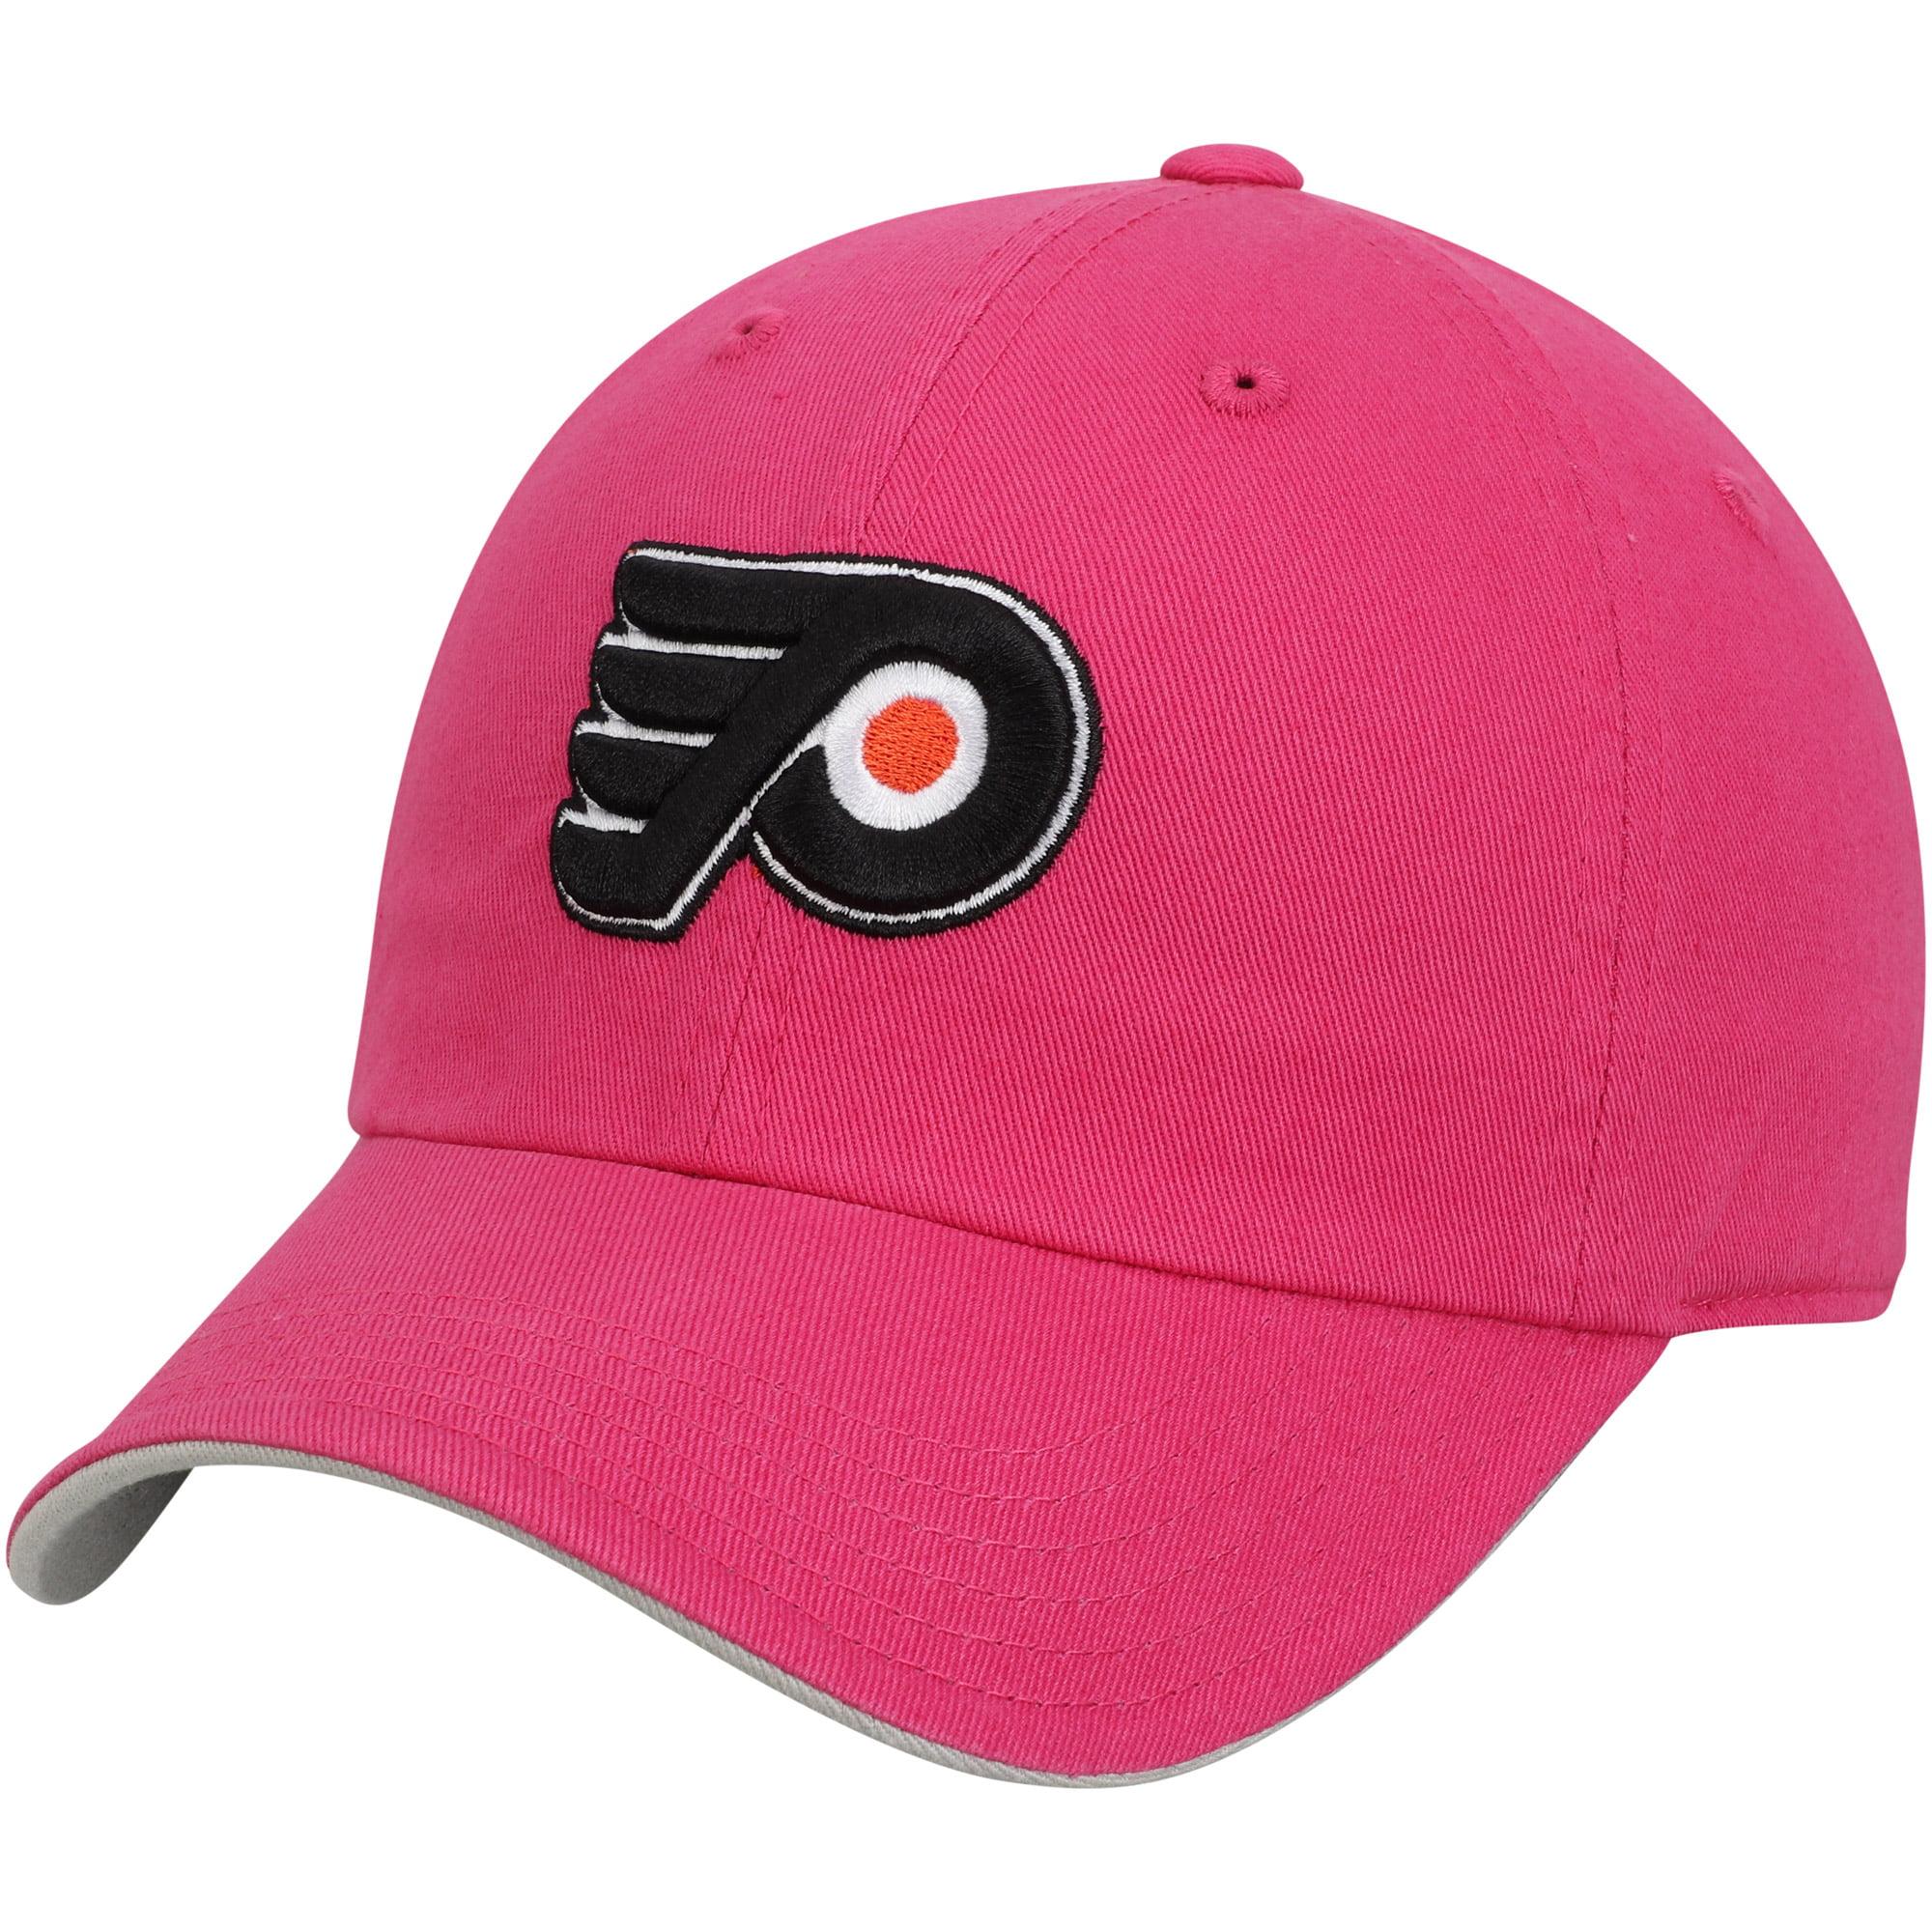 Philadelphia Flyers Girls Youth Slouch Adjustable Hat - Pink - OSFA